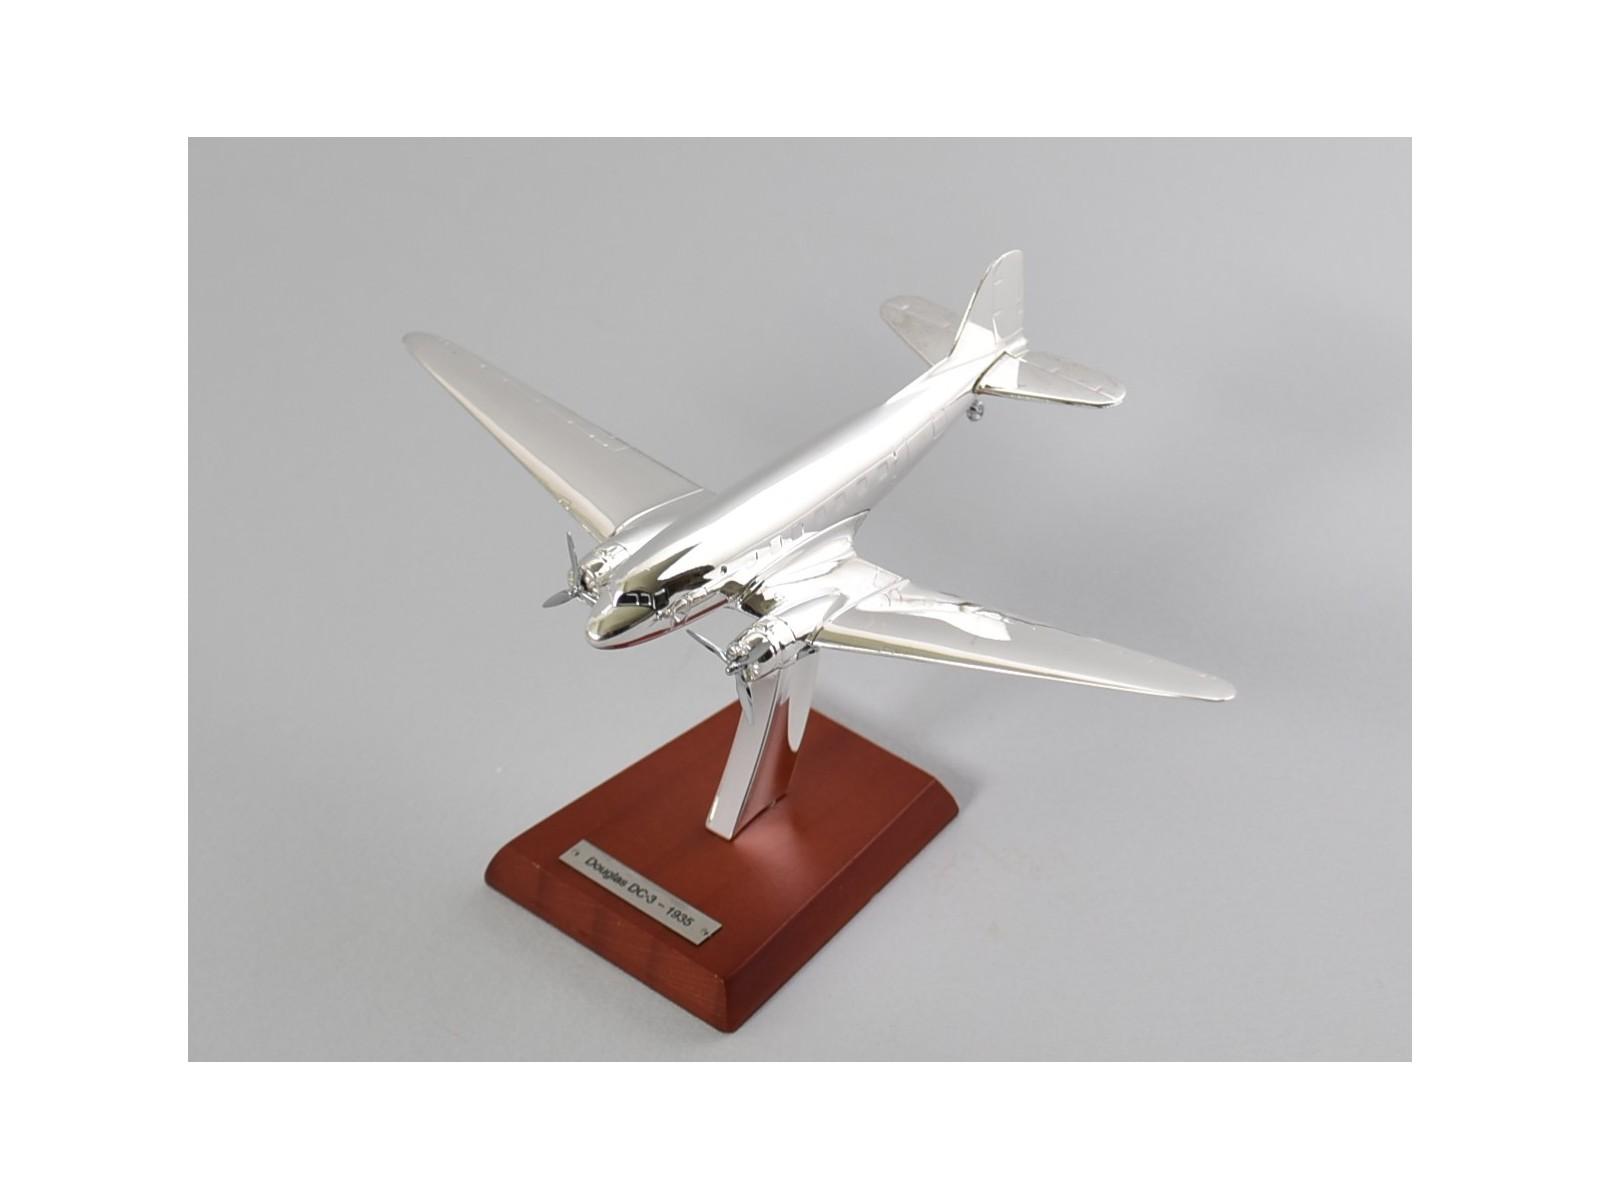 10 Scale 1:200 PLANE AIRCRAFT ATLAS PLATED SILVER Douglas DC-3-1935